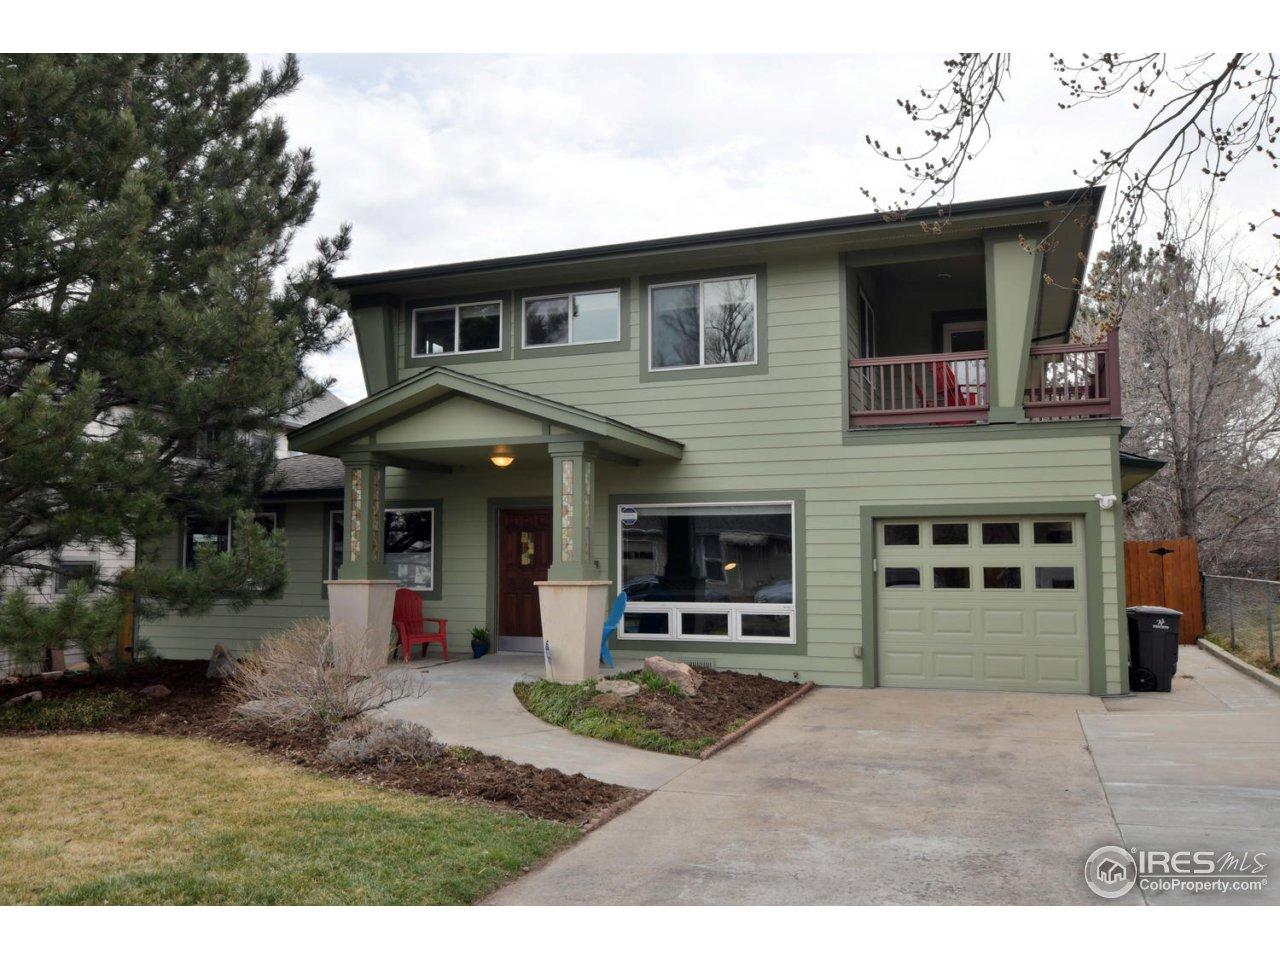 110 30th St, Boulder CO 80305